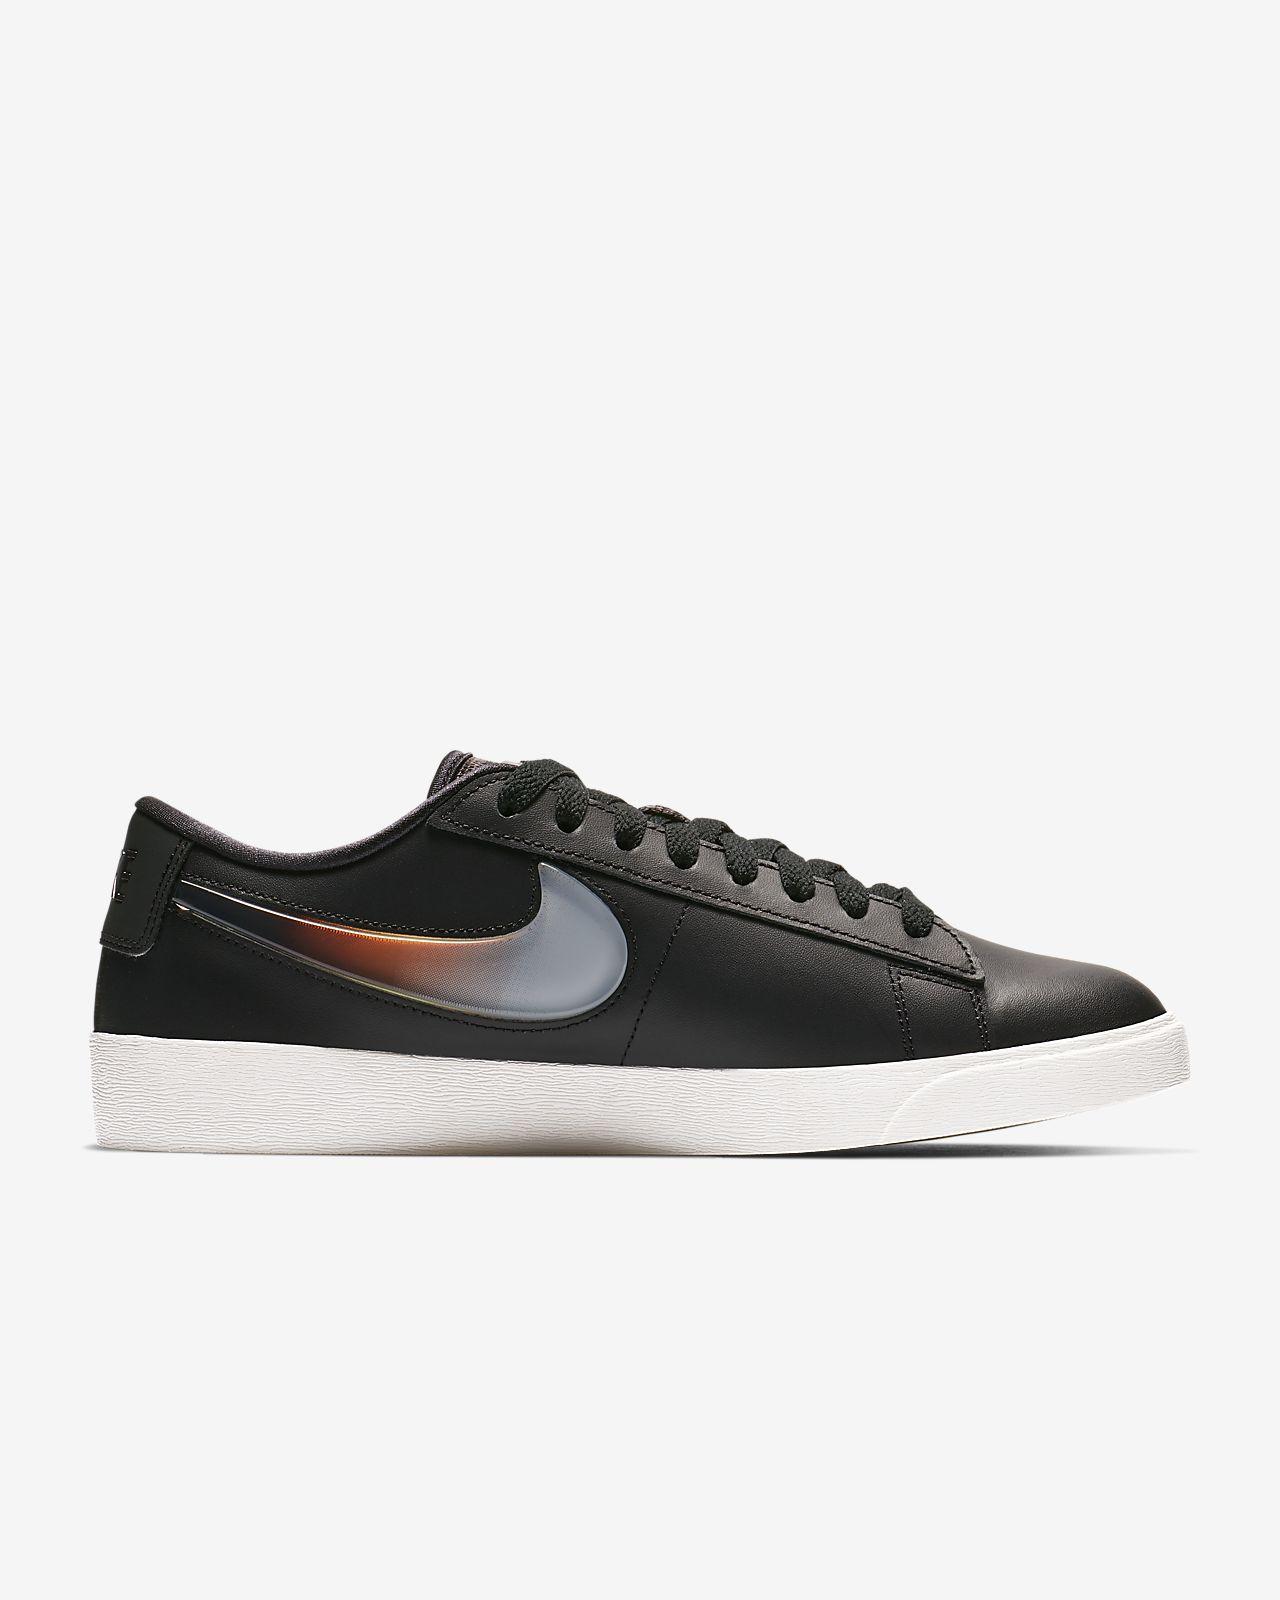 buy popular 073d6 c3095 ... Nike Blazer Low Lux Premium Womens Shoe